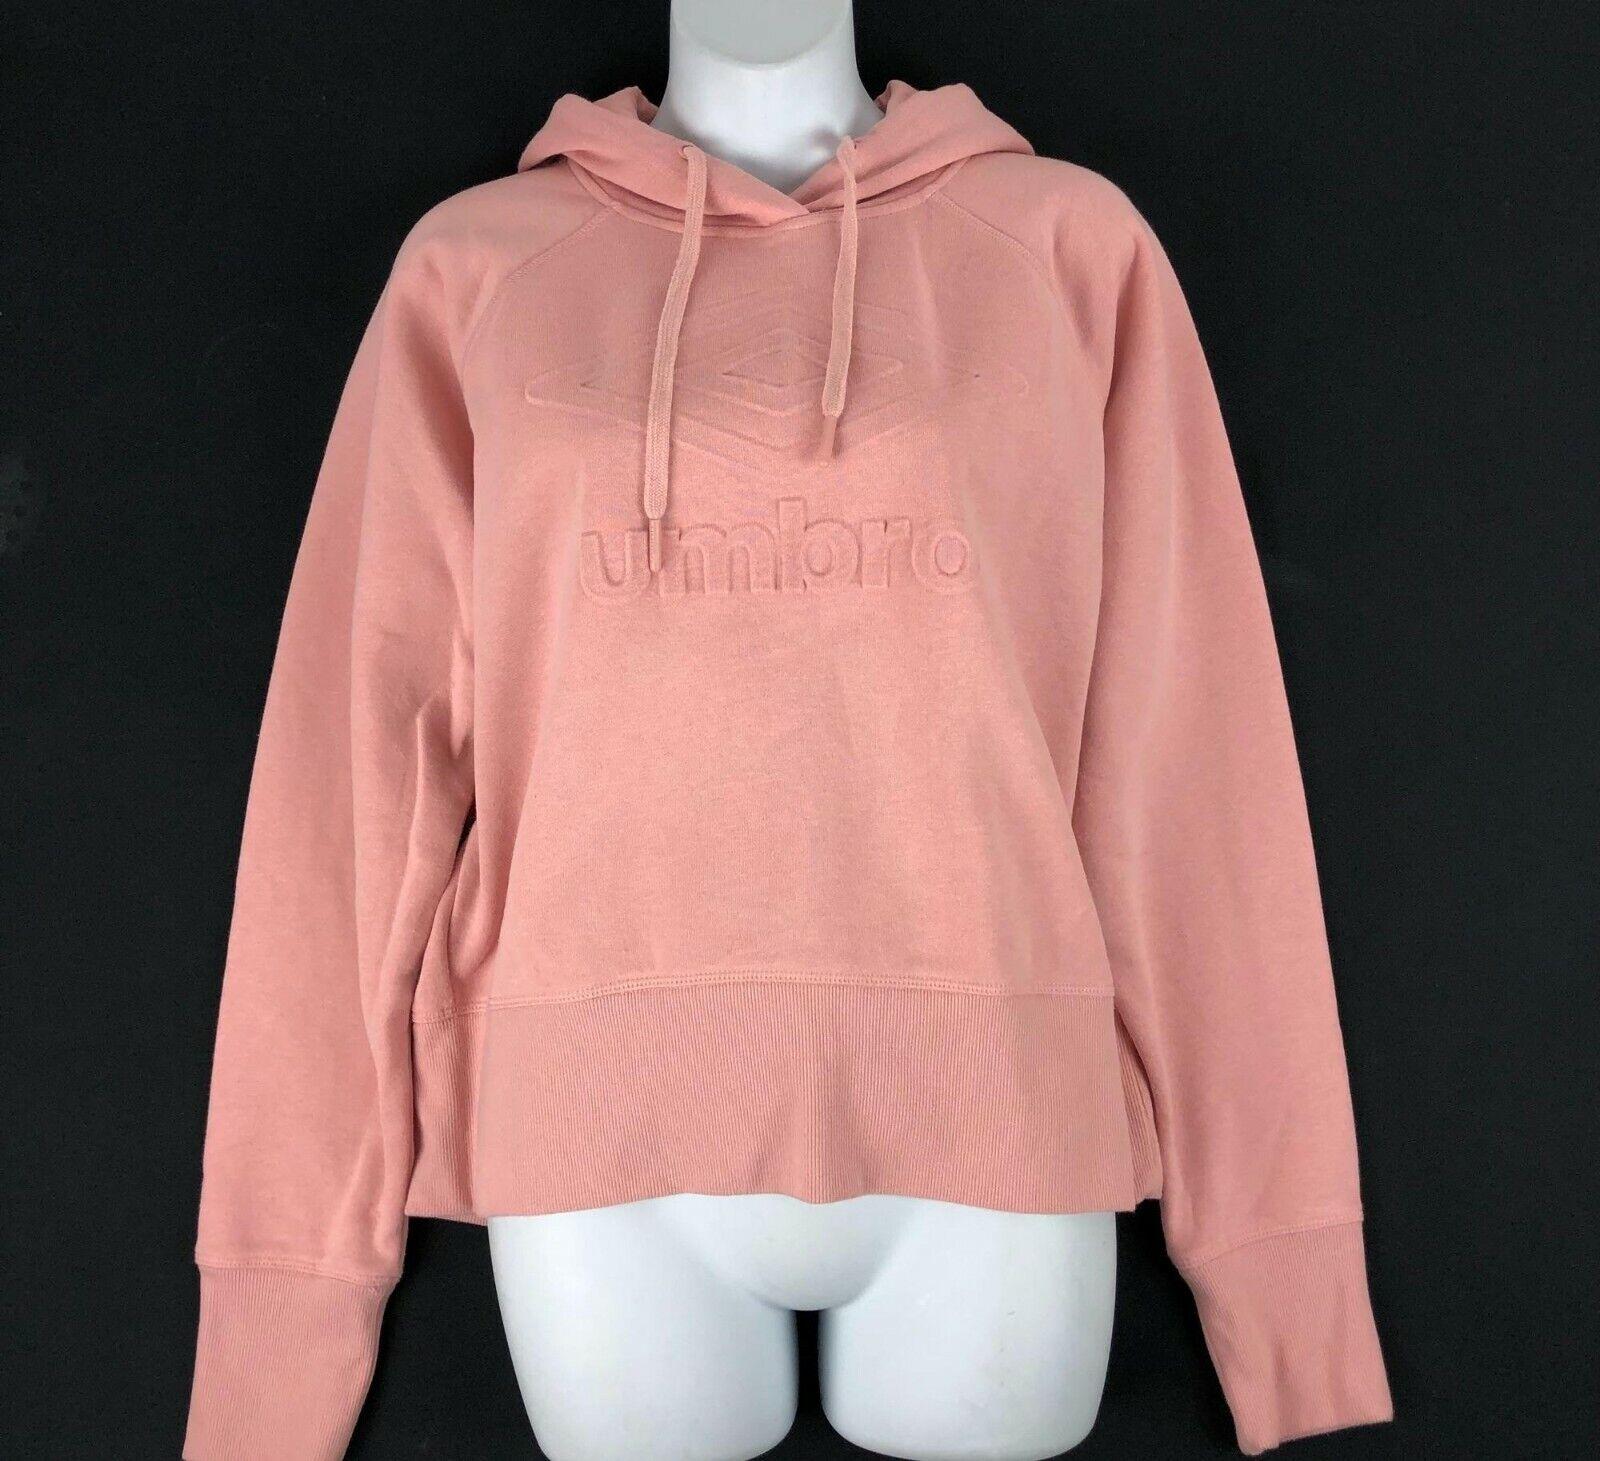 UMBRO Women's Pink Athletic Pullover Hoodie Sweatshirt Sz L